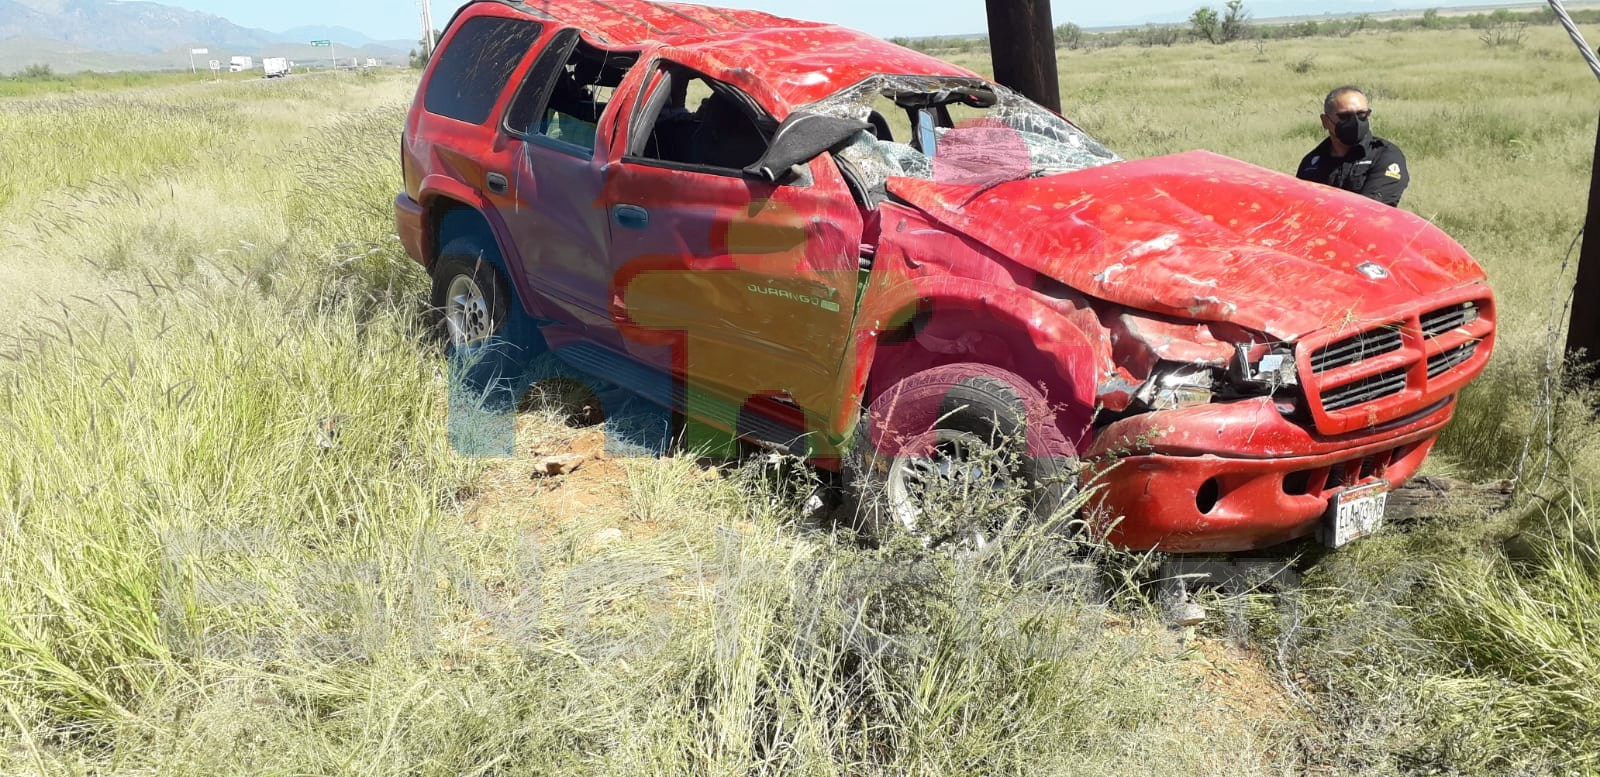 Volcadura rumbo a Juárez; 1 muerto y 3 heridos